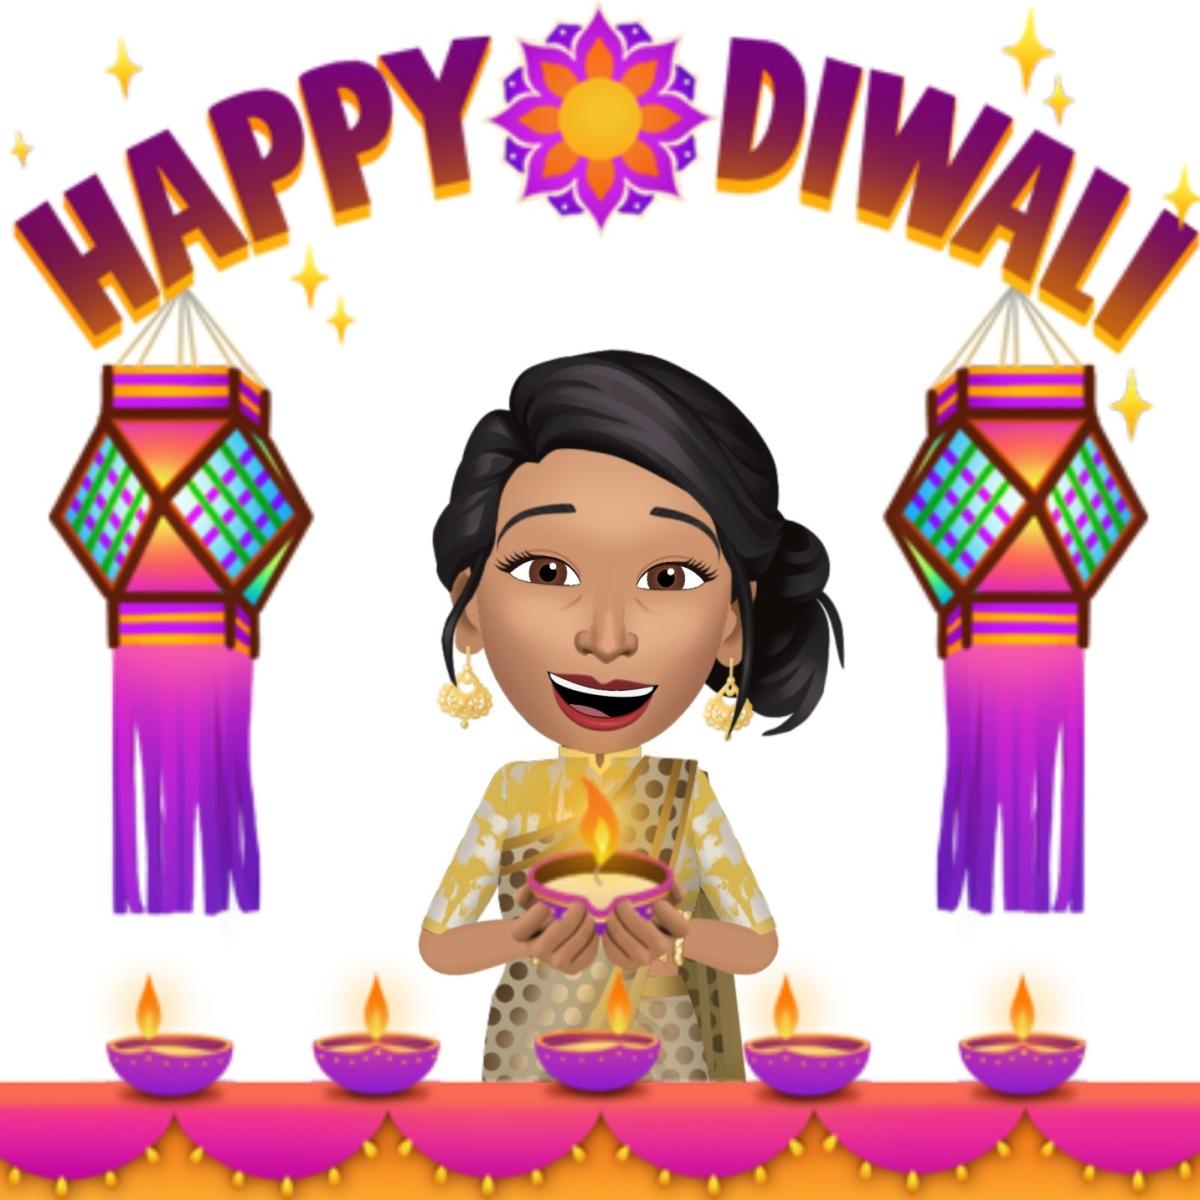 Facebook launches #DiwaliAtHomeChallenge